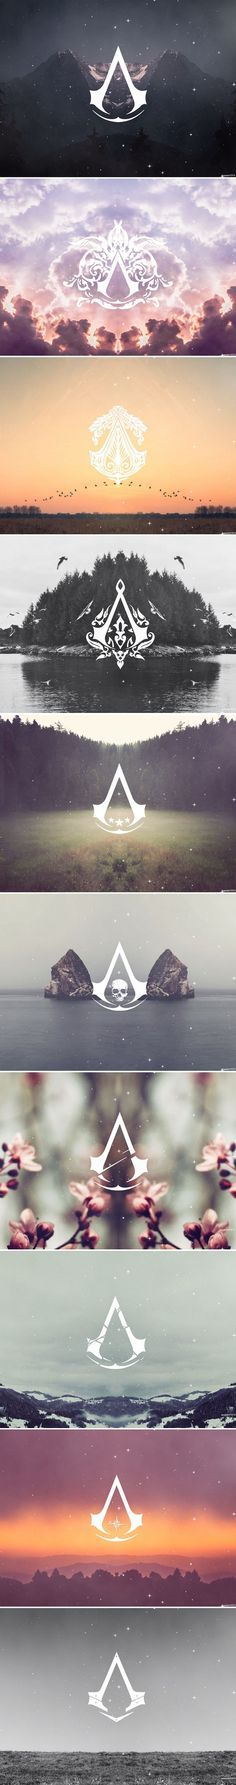 Assassin's Creed Logos: